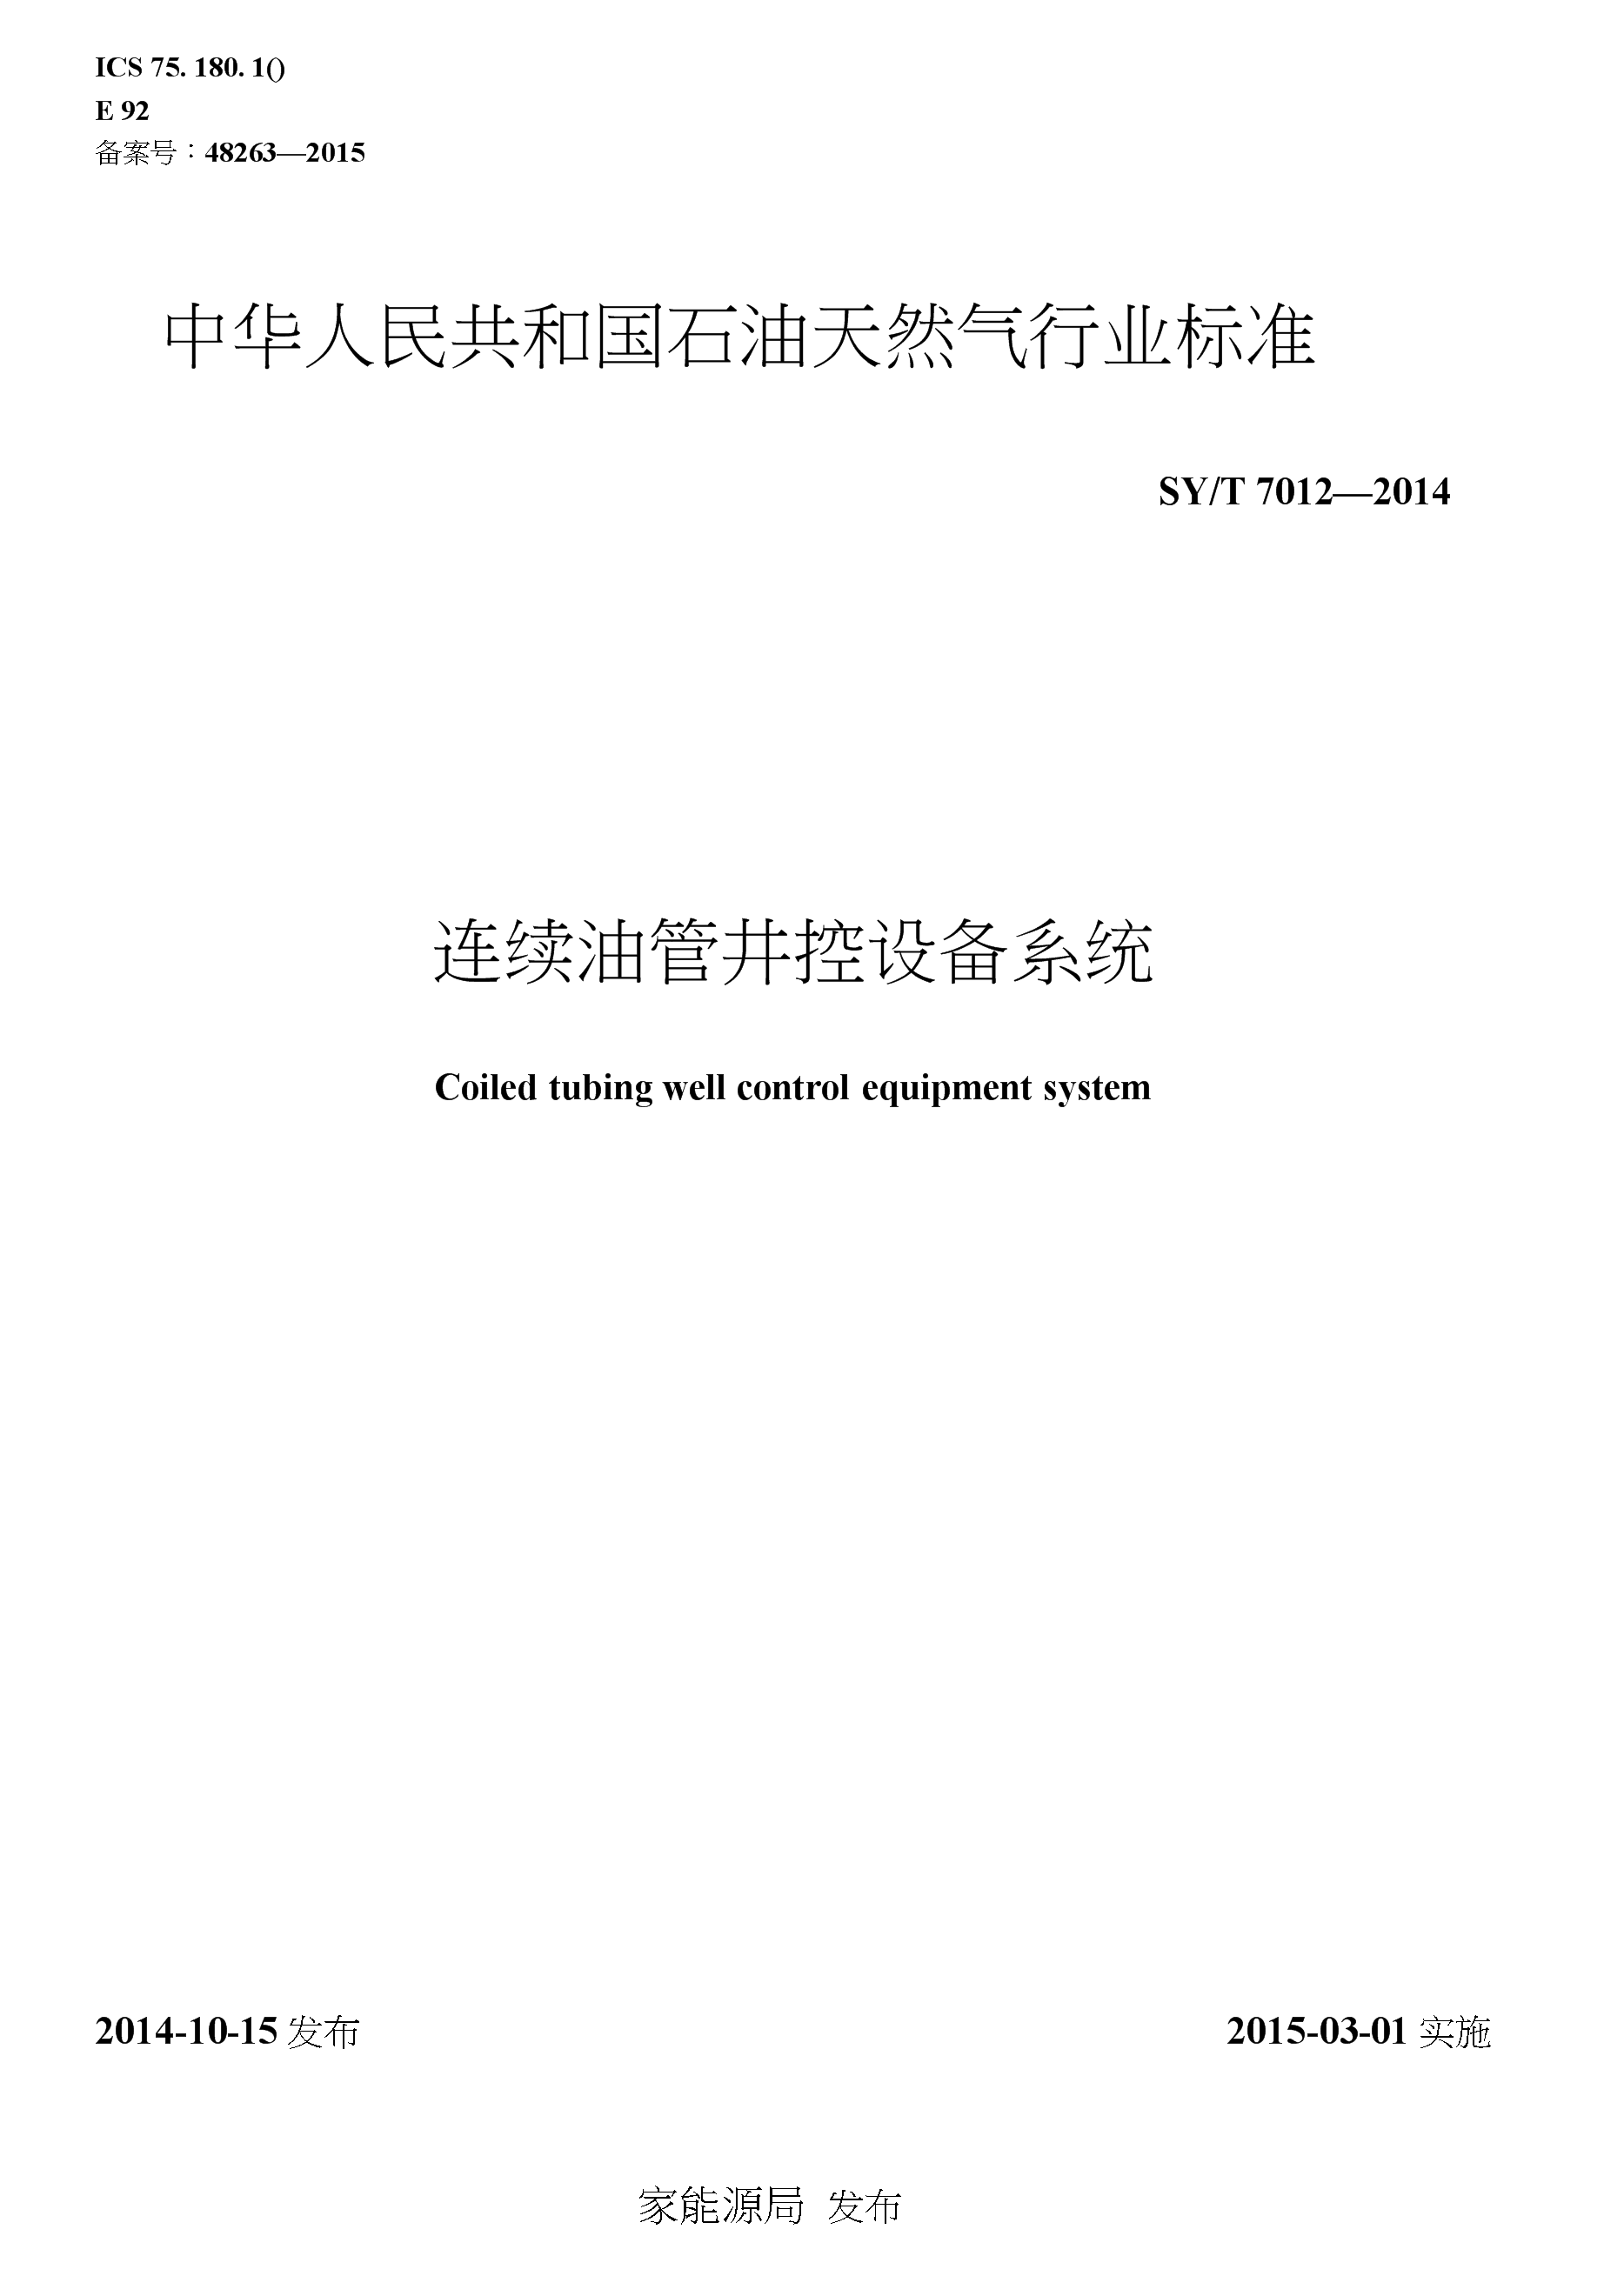 SY∕T 7012-2014 连续油管井控设备系统.docx